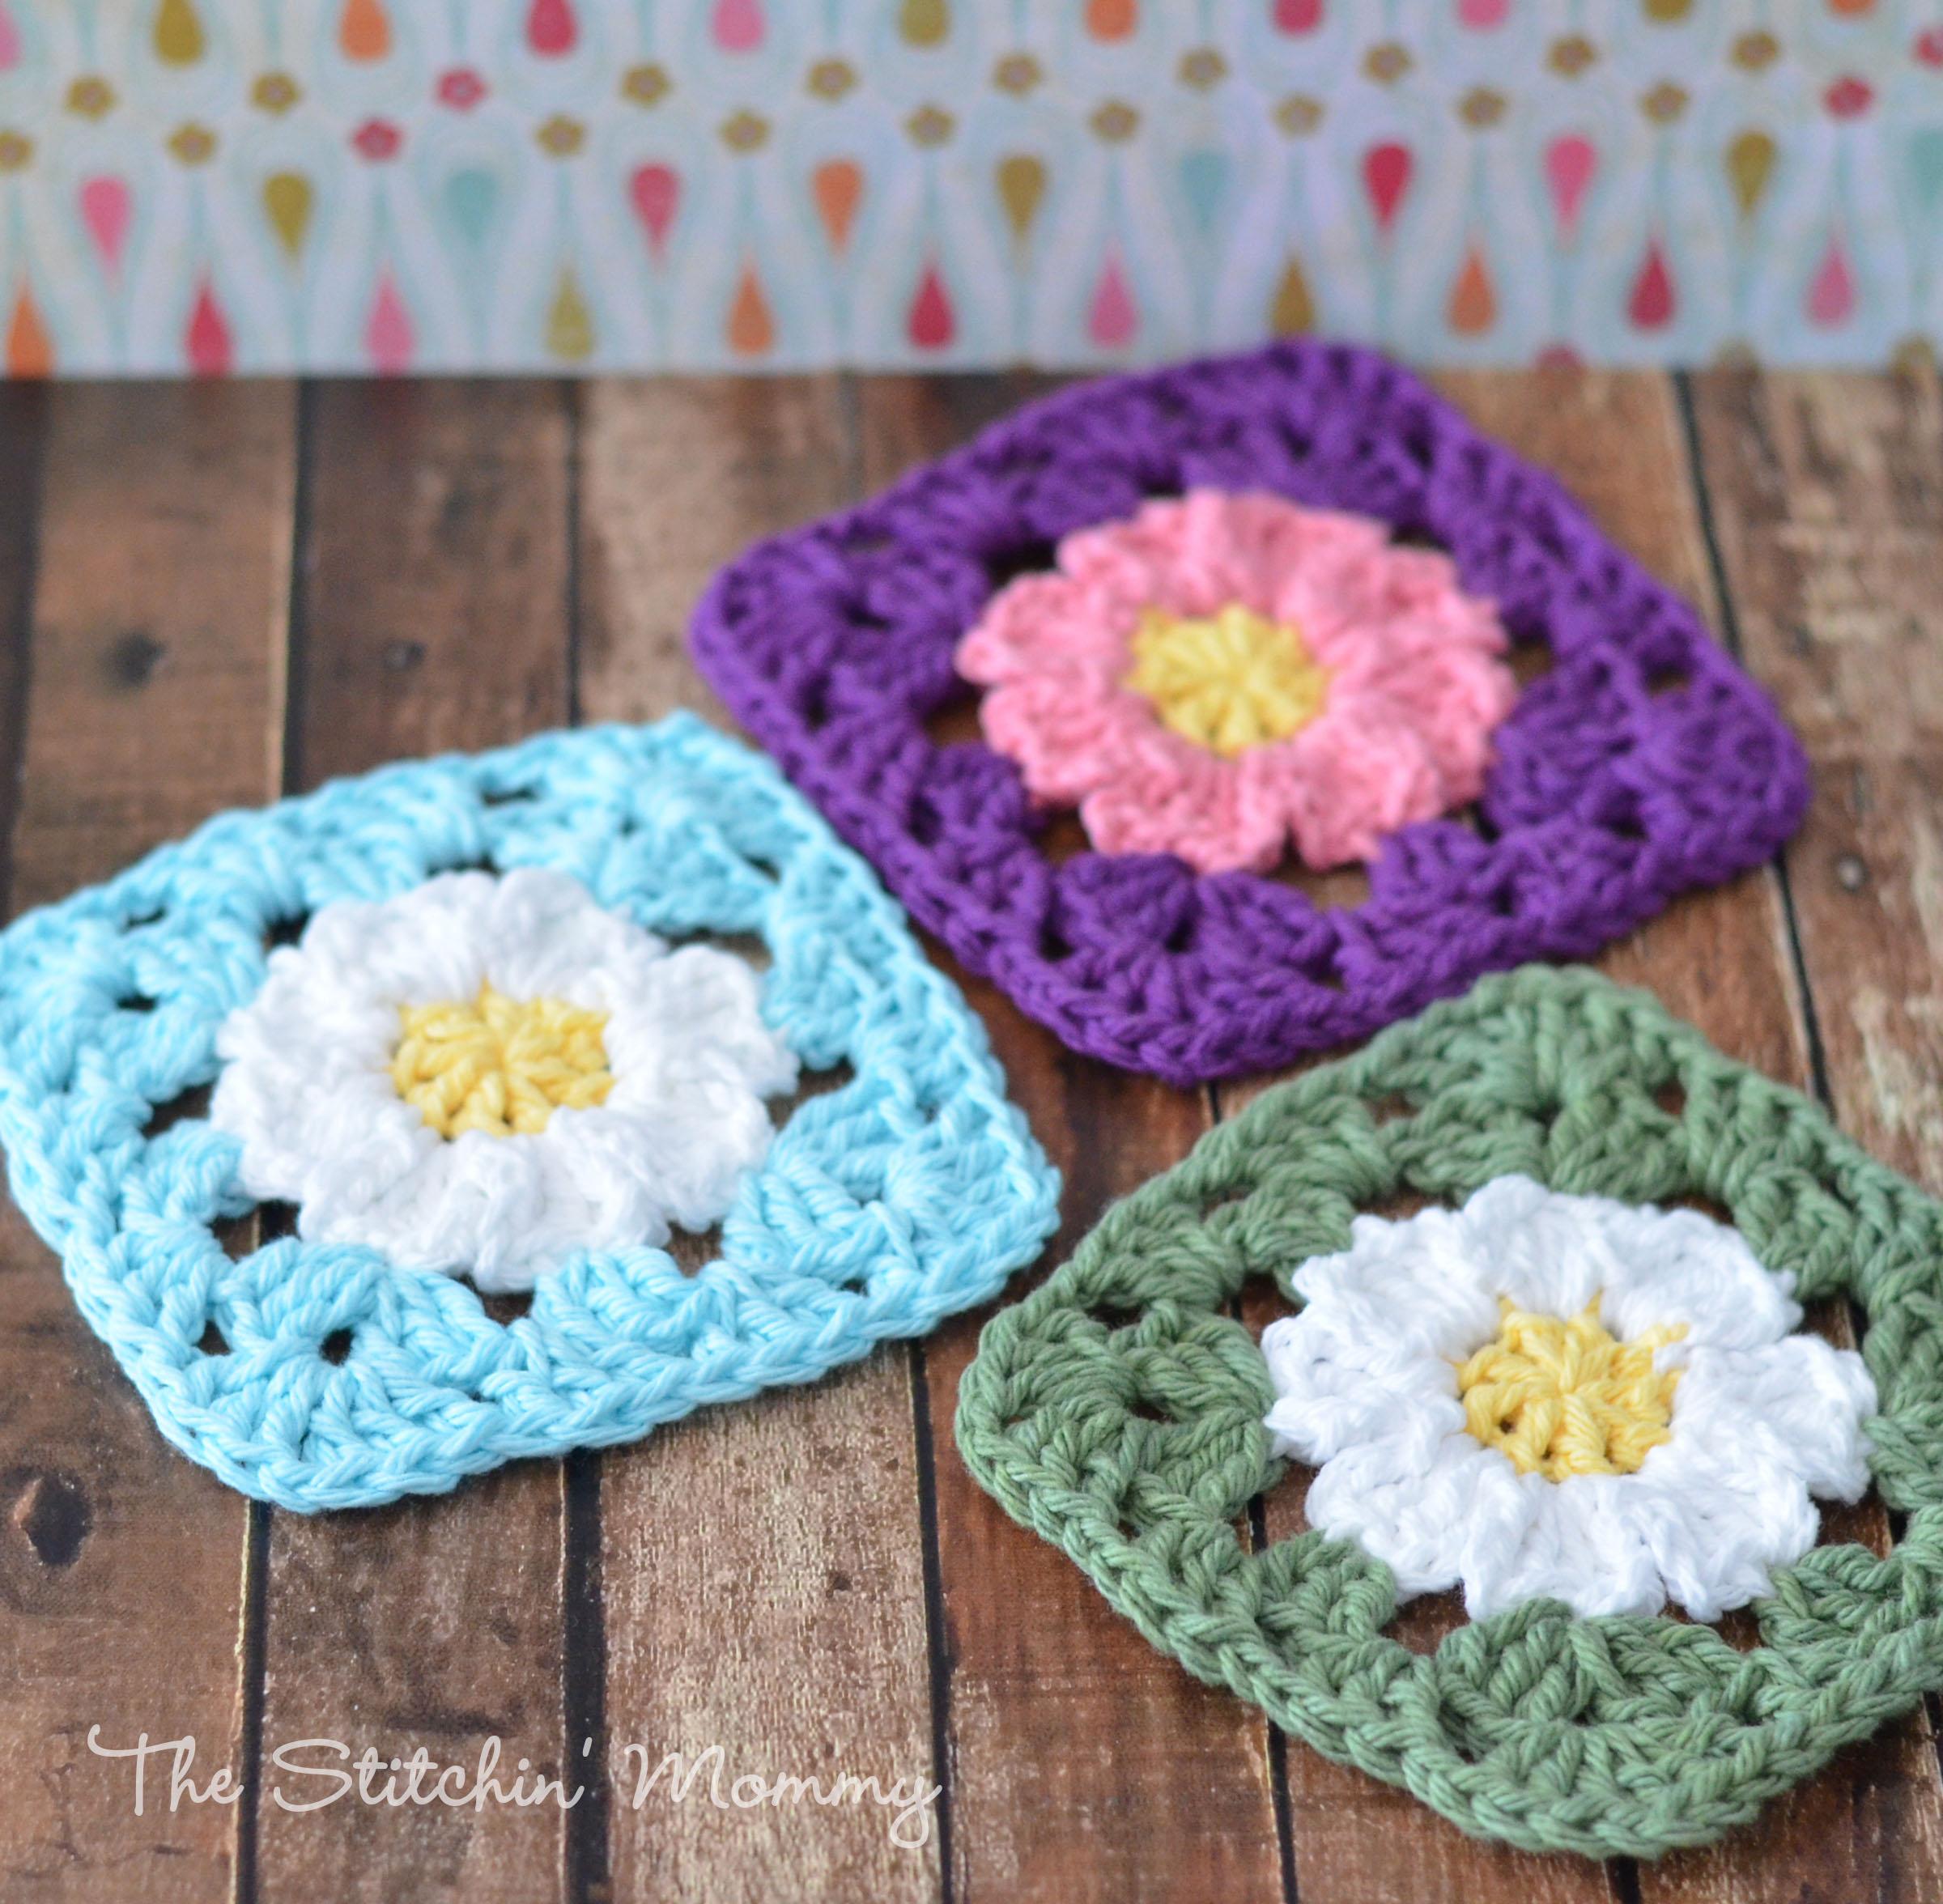 Daisy Granny Square Blanket Pattern Crochet Daisy Granny Square